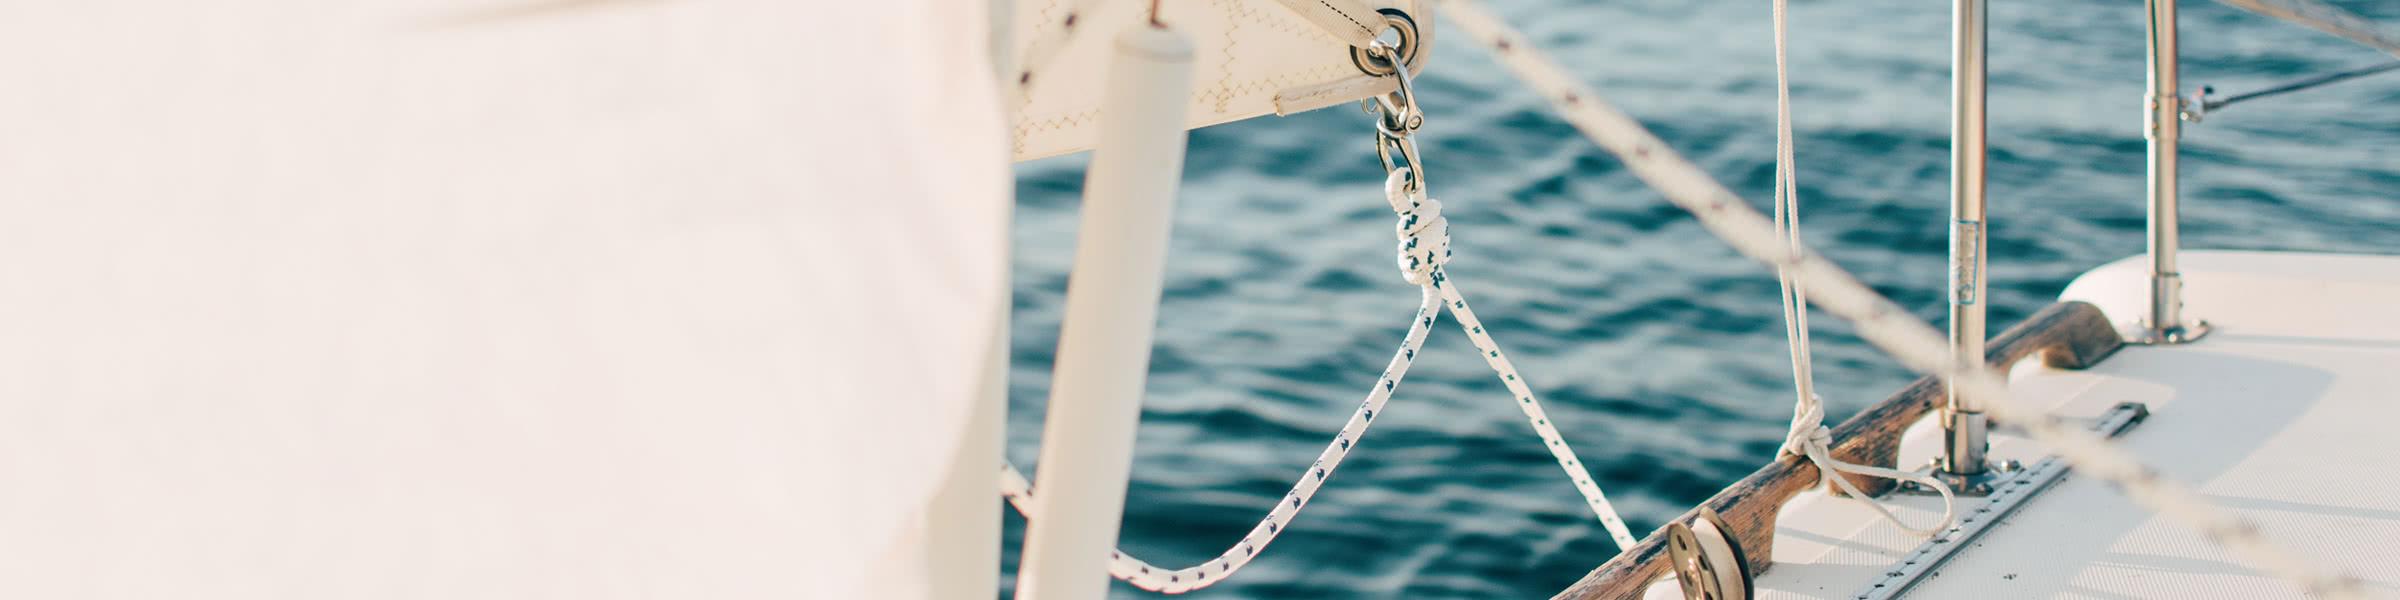 La corde du yacht